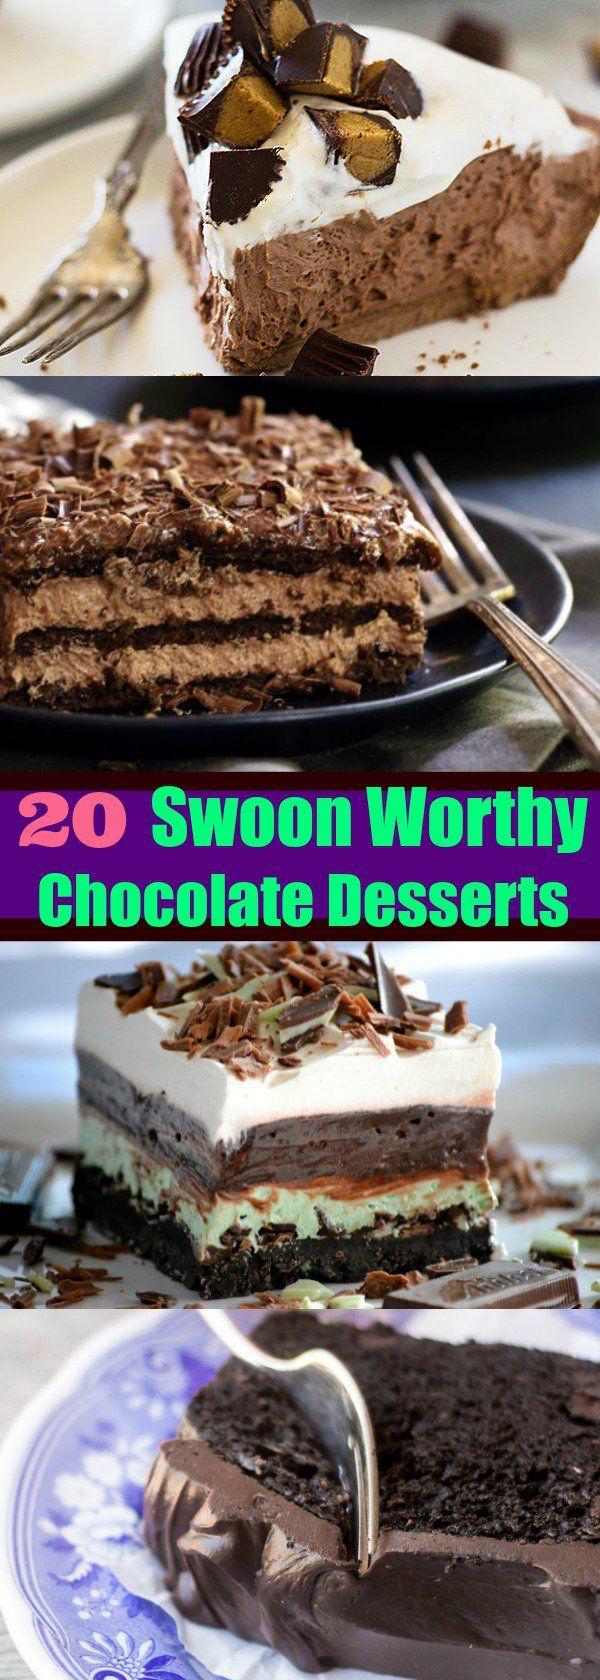 20 Swoon-Worthy Chocolate Desserts